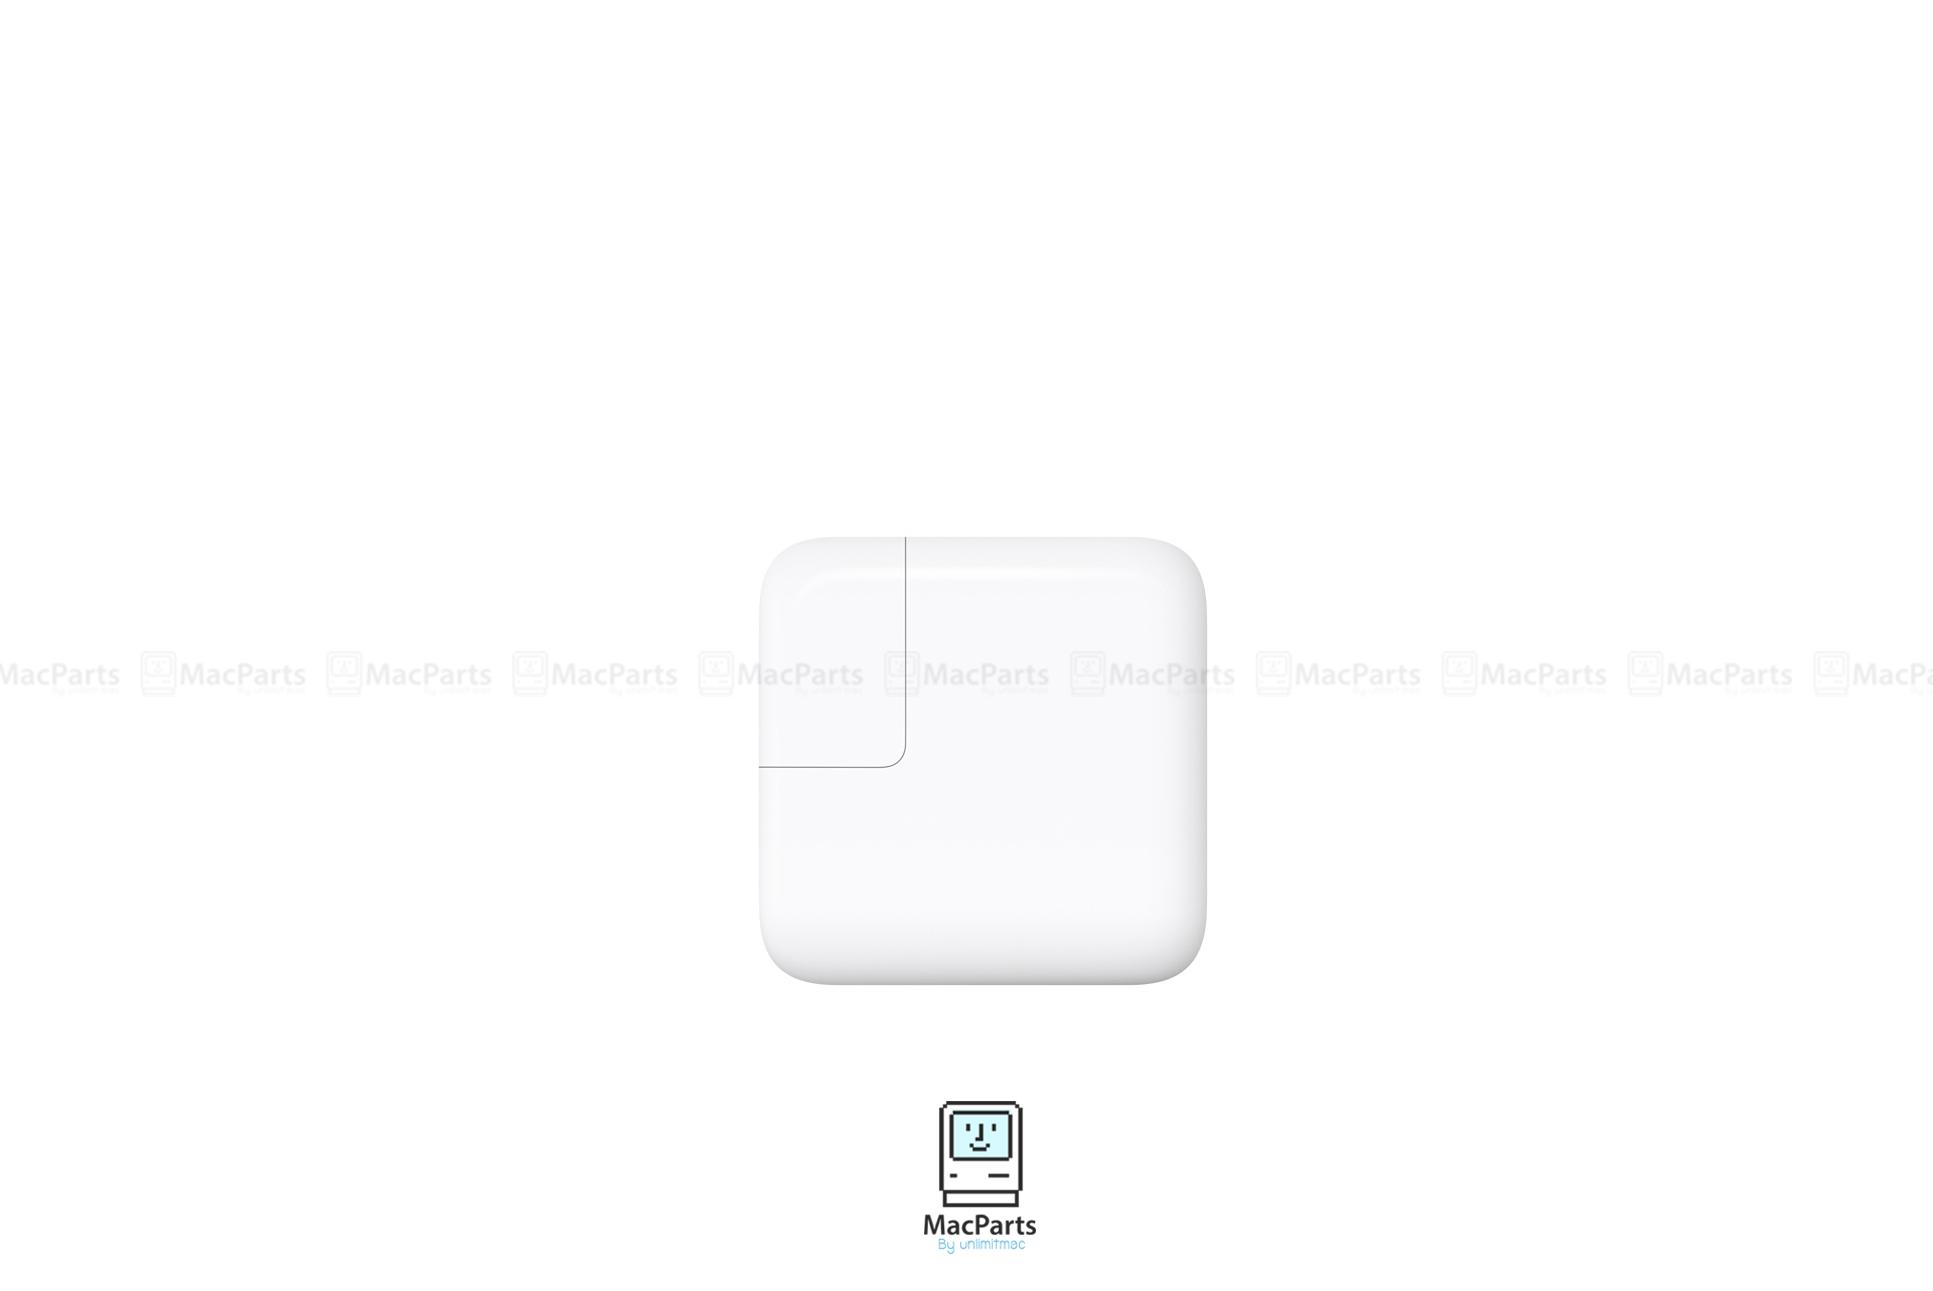 Apple 29W USB-C Power Adapter (No Box)